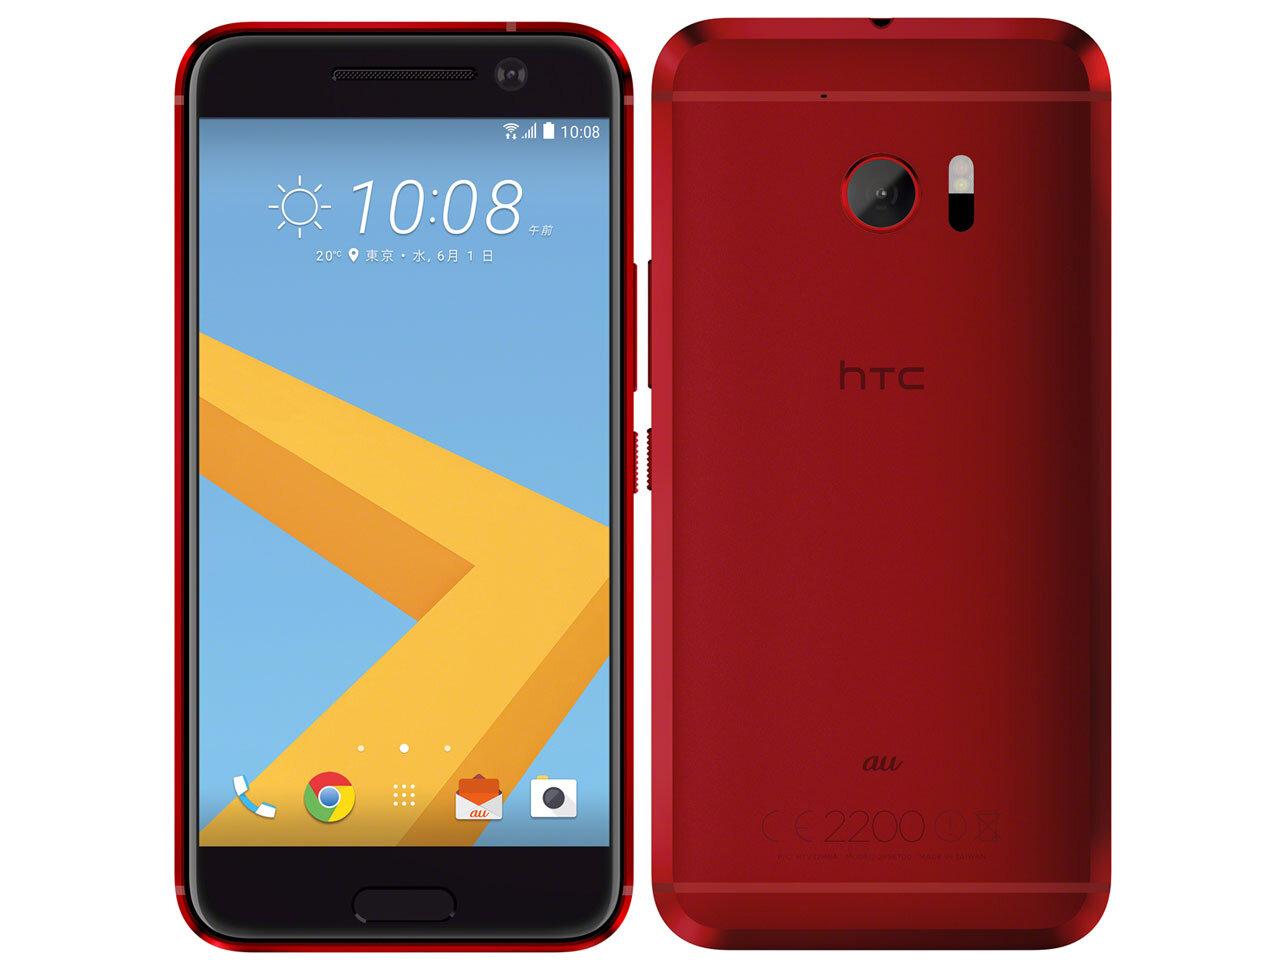 Au by KDDIから「HTC 10 HTV32」が登場!スペックや価格・発売日情報